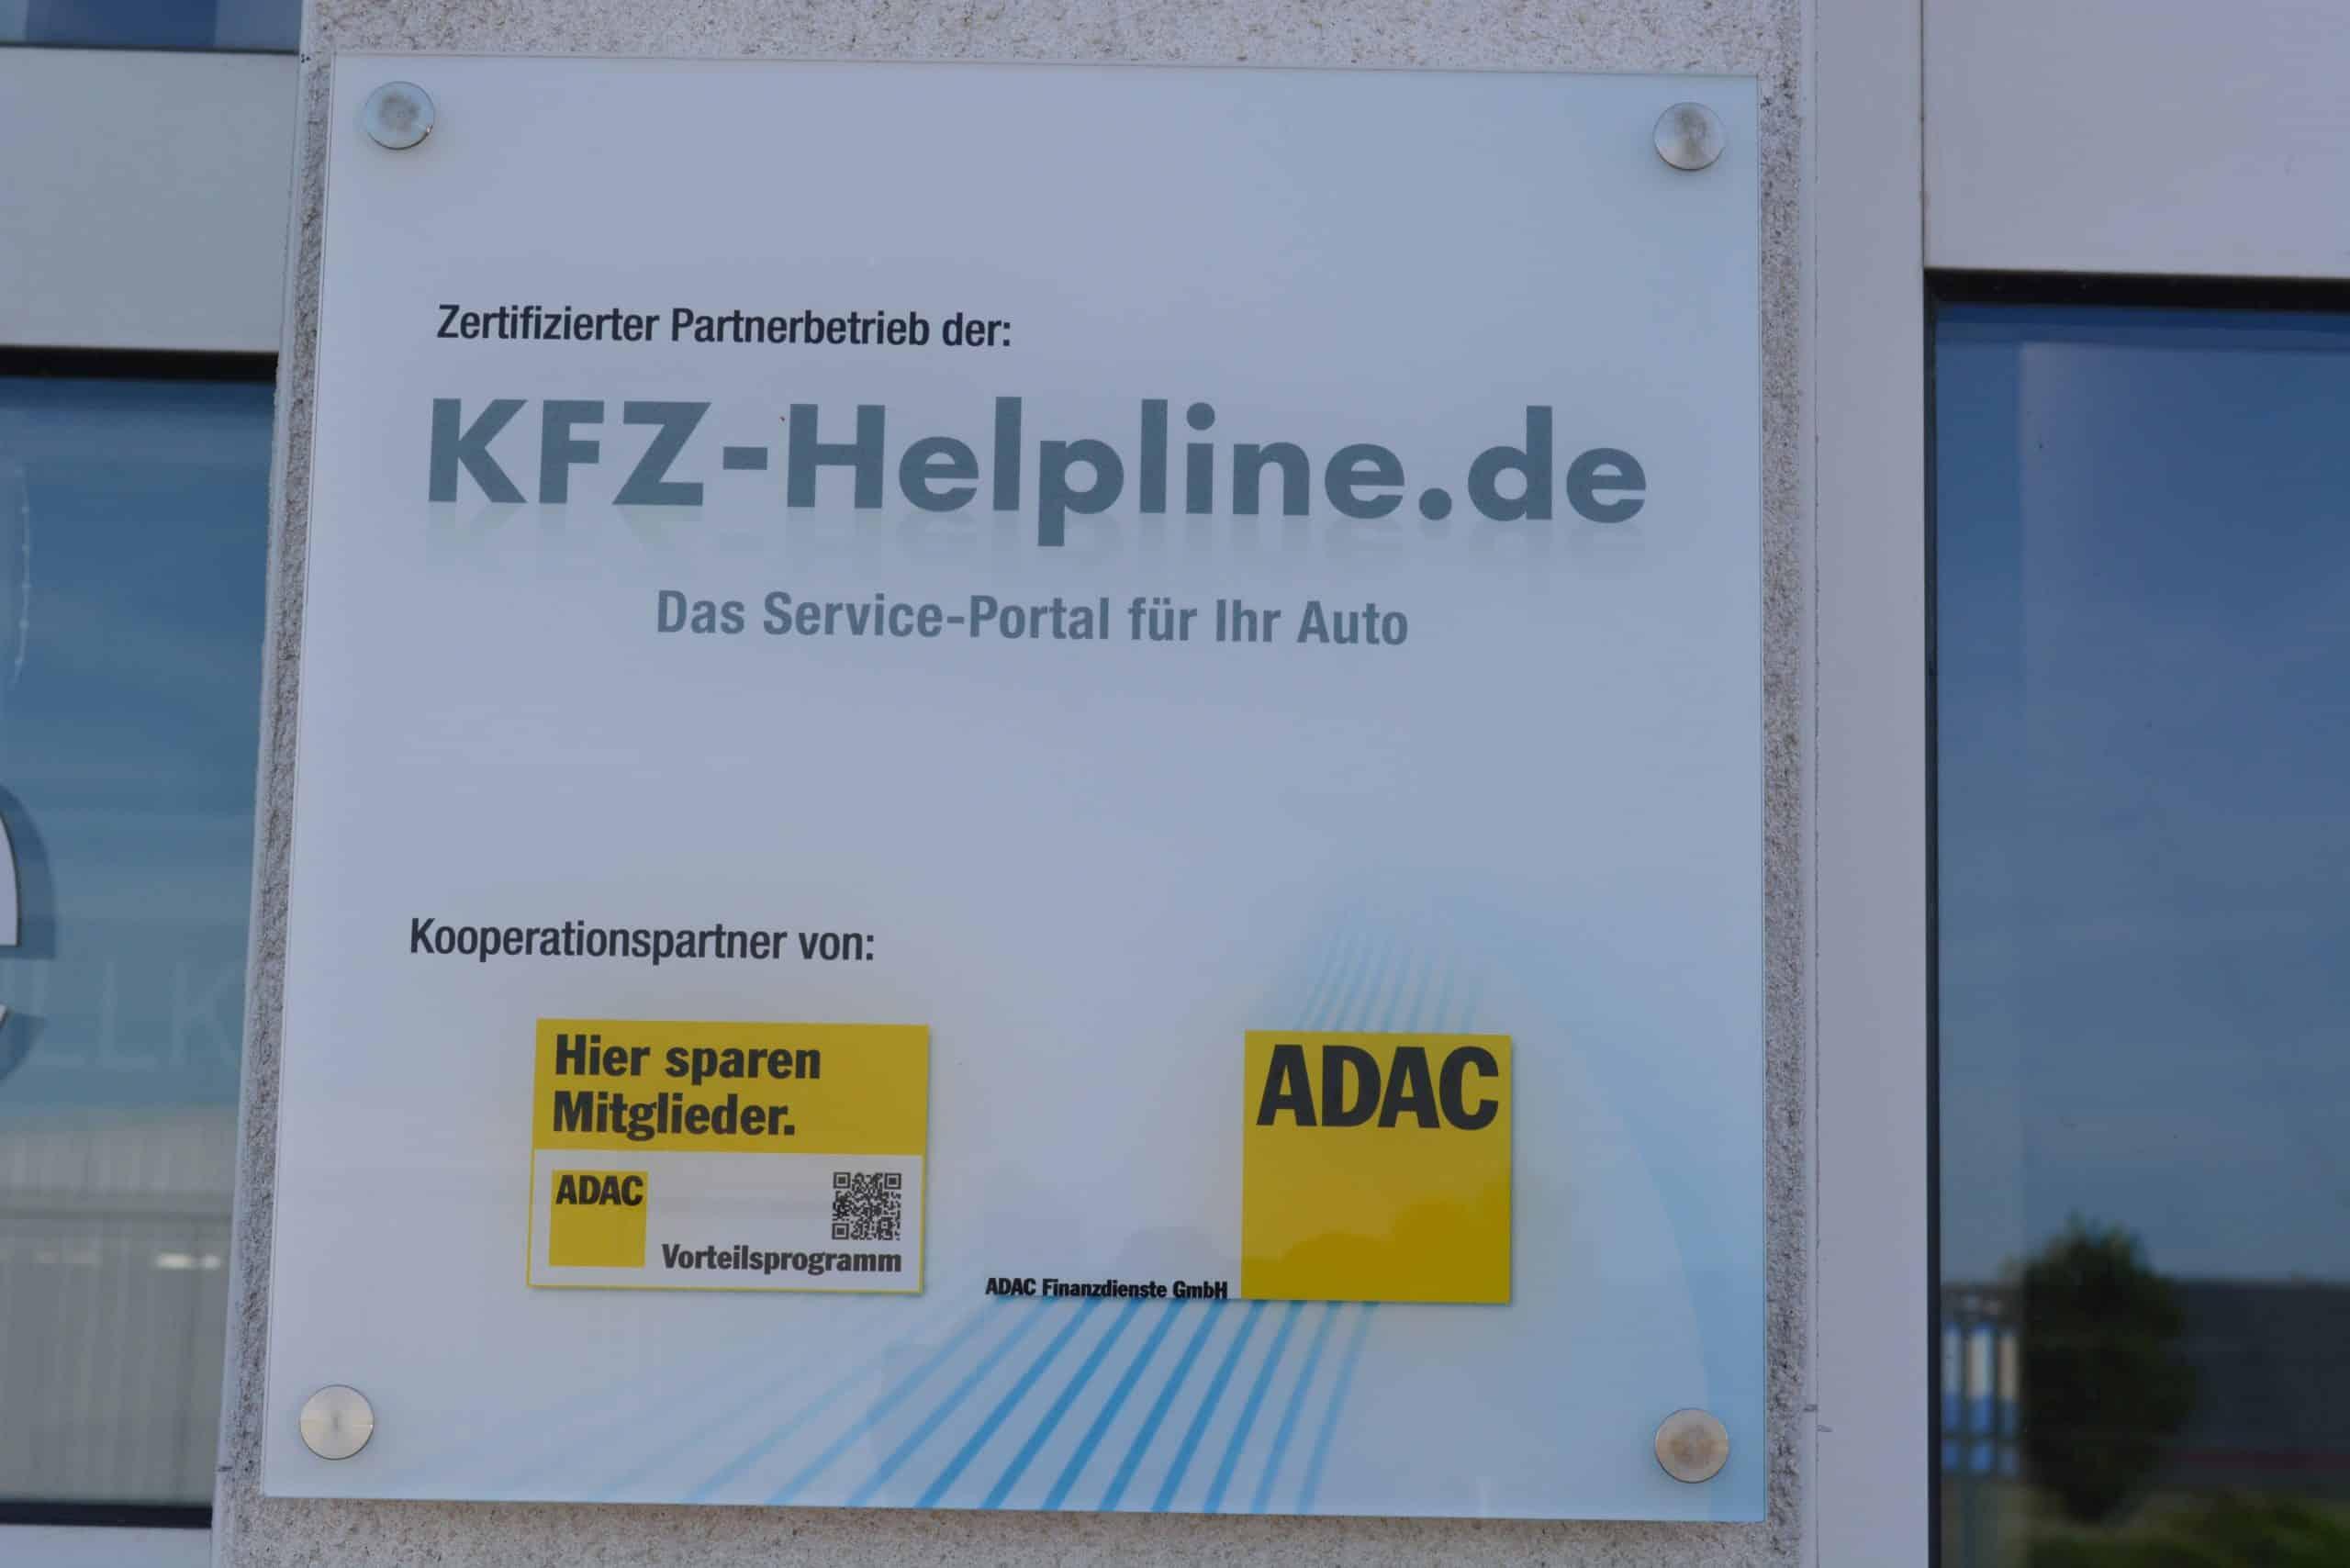 KFZ Helpline